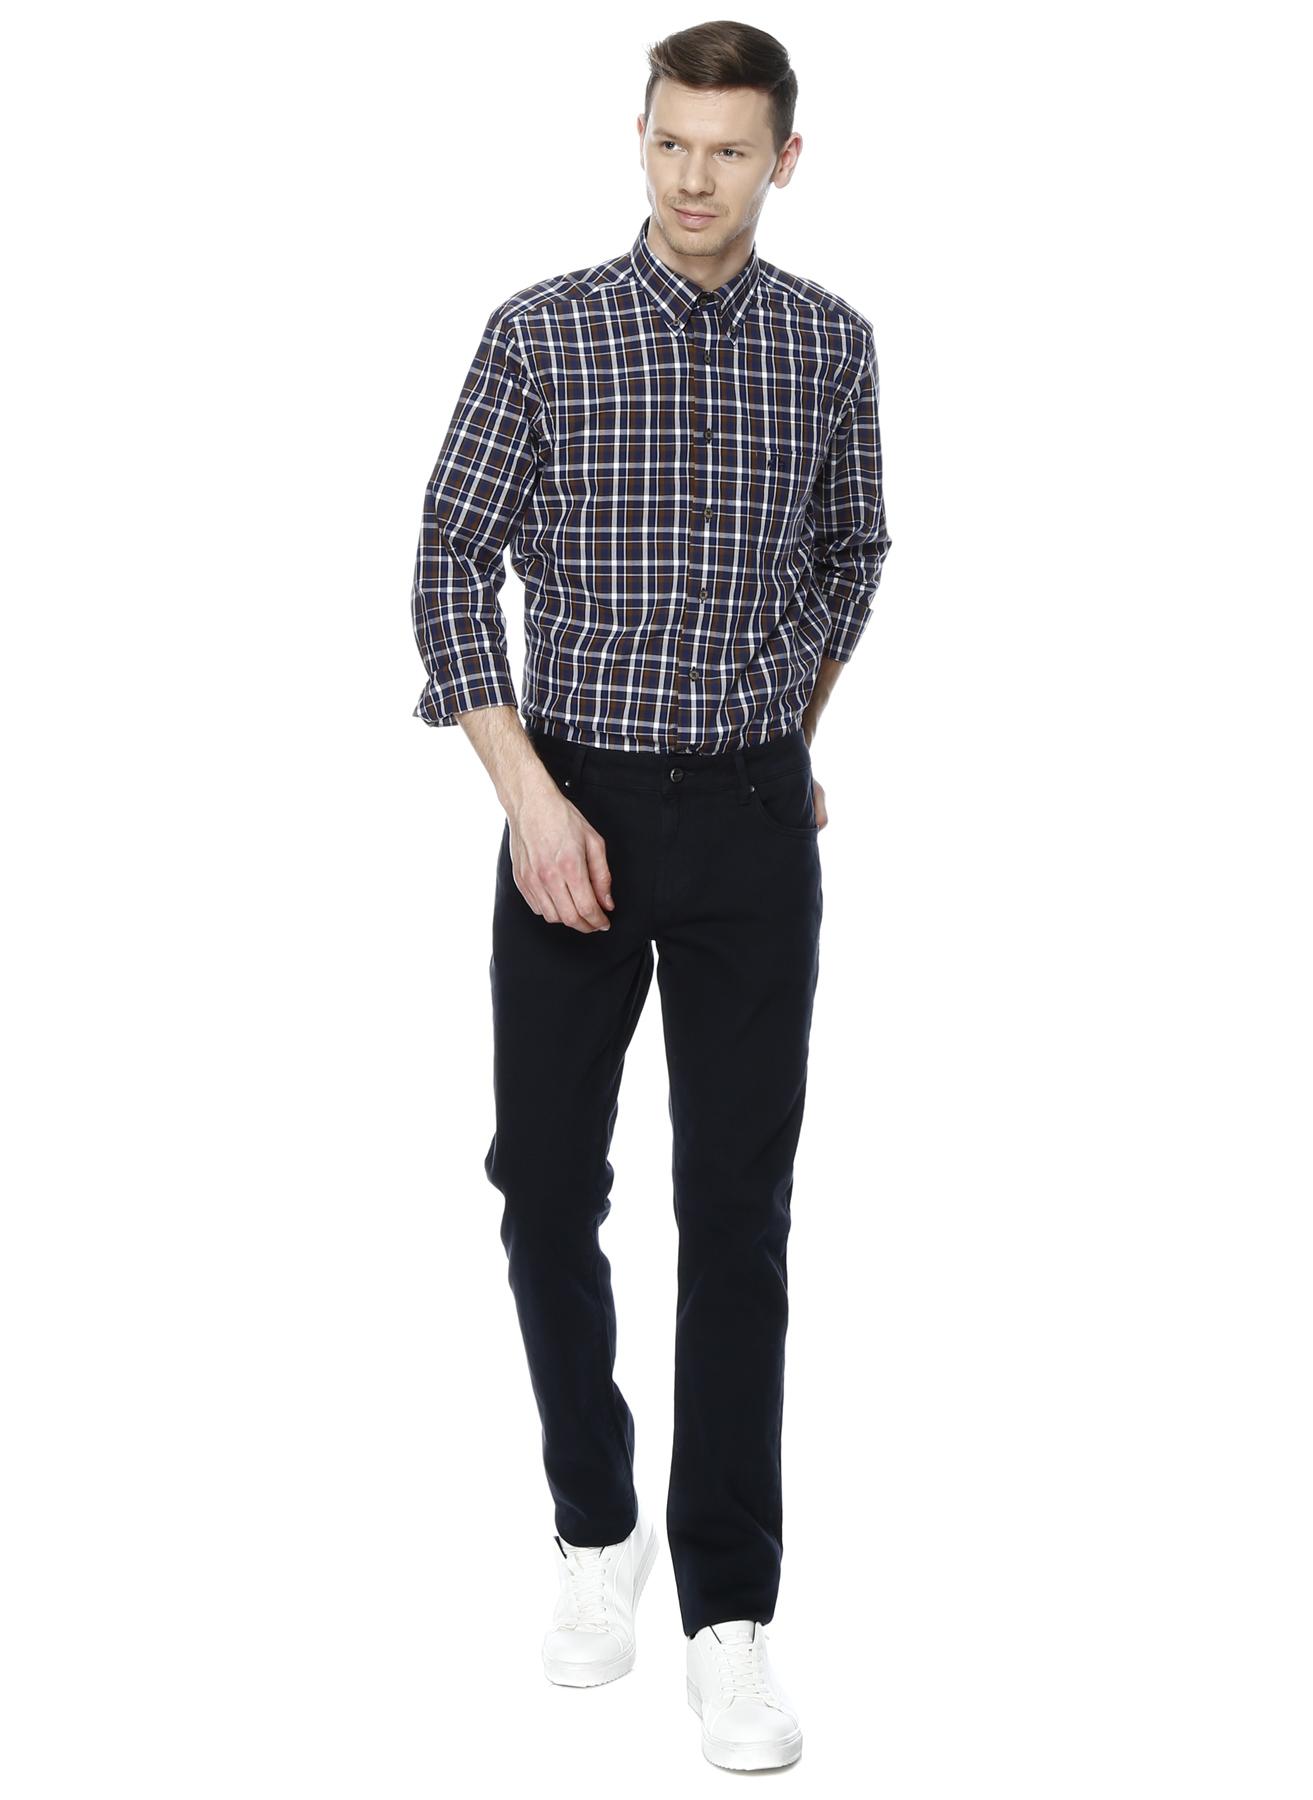 George Hogg Lacivert Boru Paça Casual Klasik Pantolon 36-34 5000204013002 Ürün Resmi